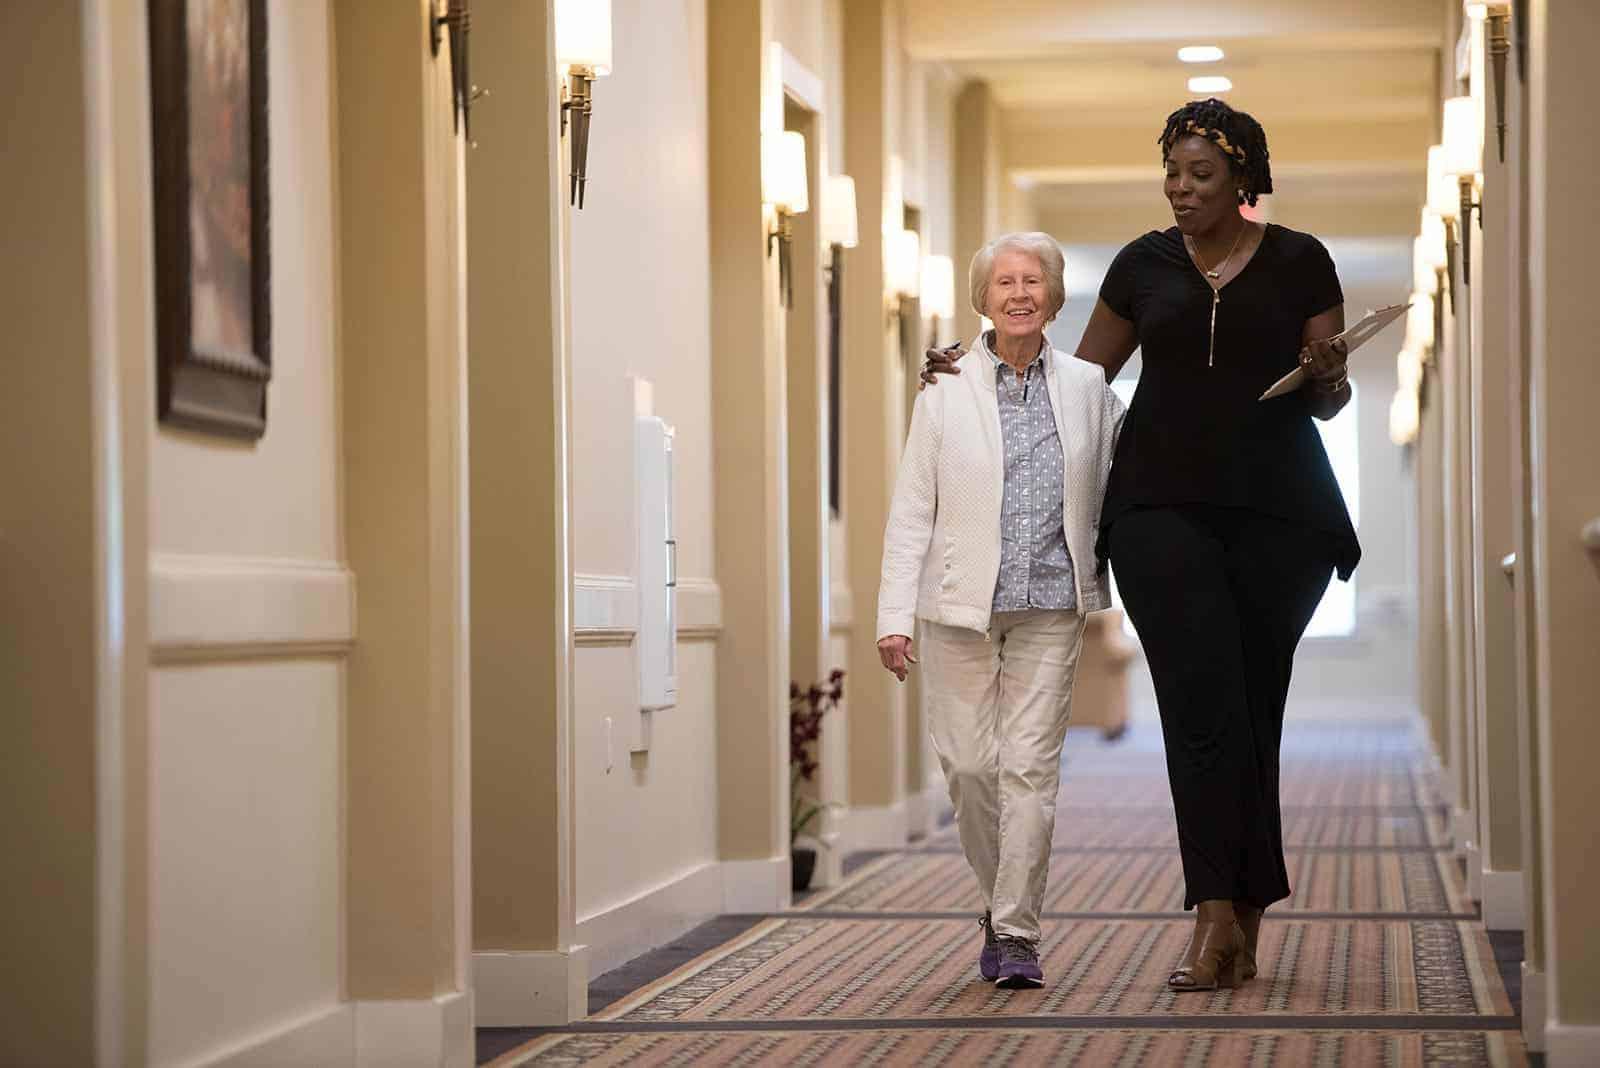 Staff member walking with senior woman